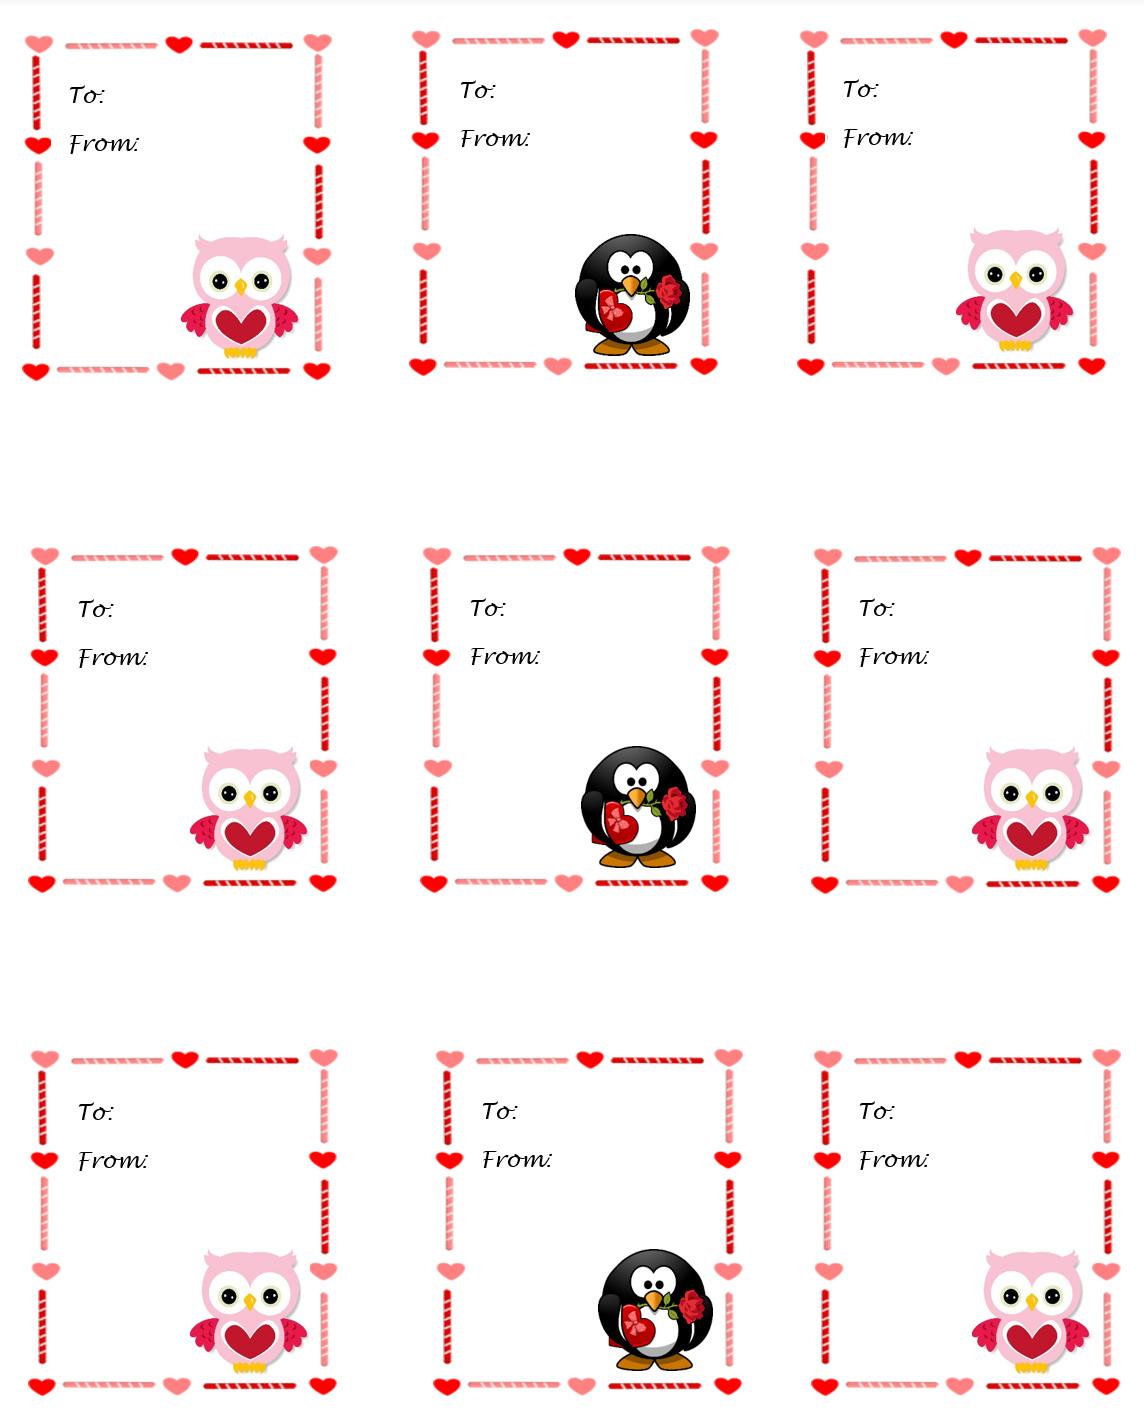 https://0201.nccdn.net/1_2/000/000/12a/282/Valentines-Day-1144x1419.jpg